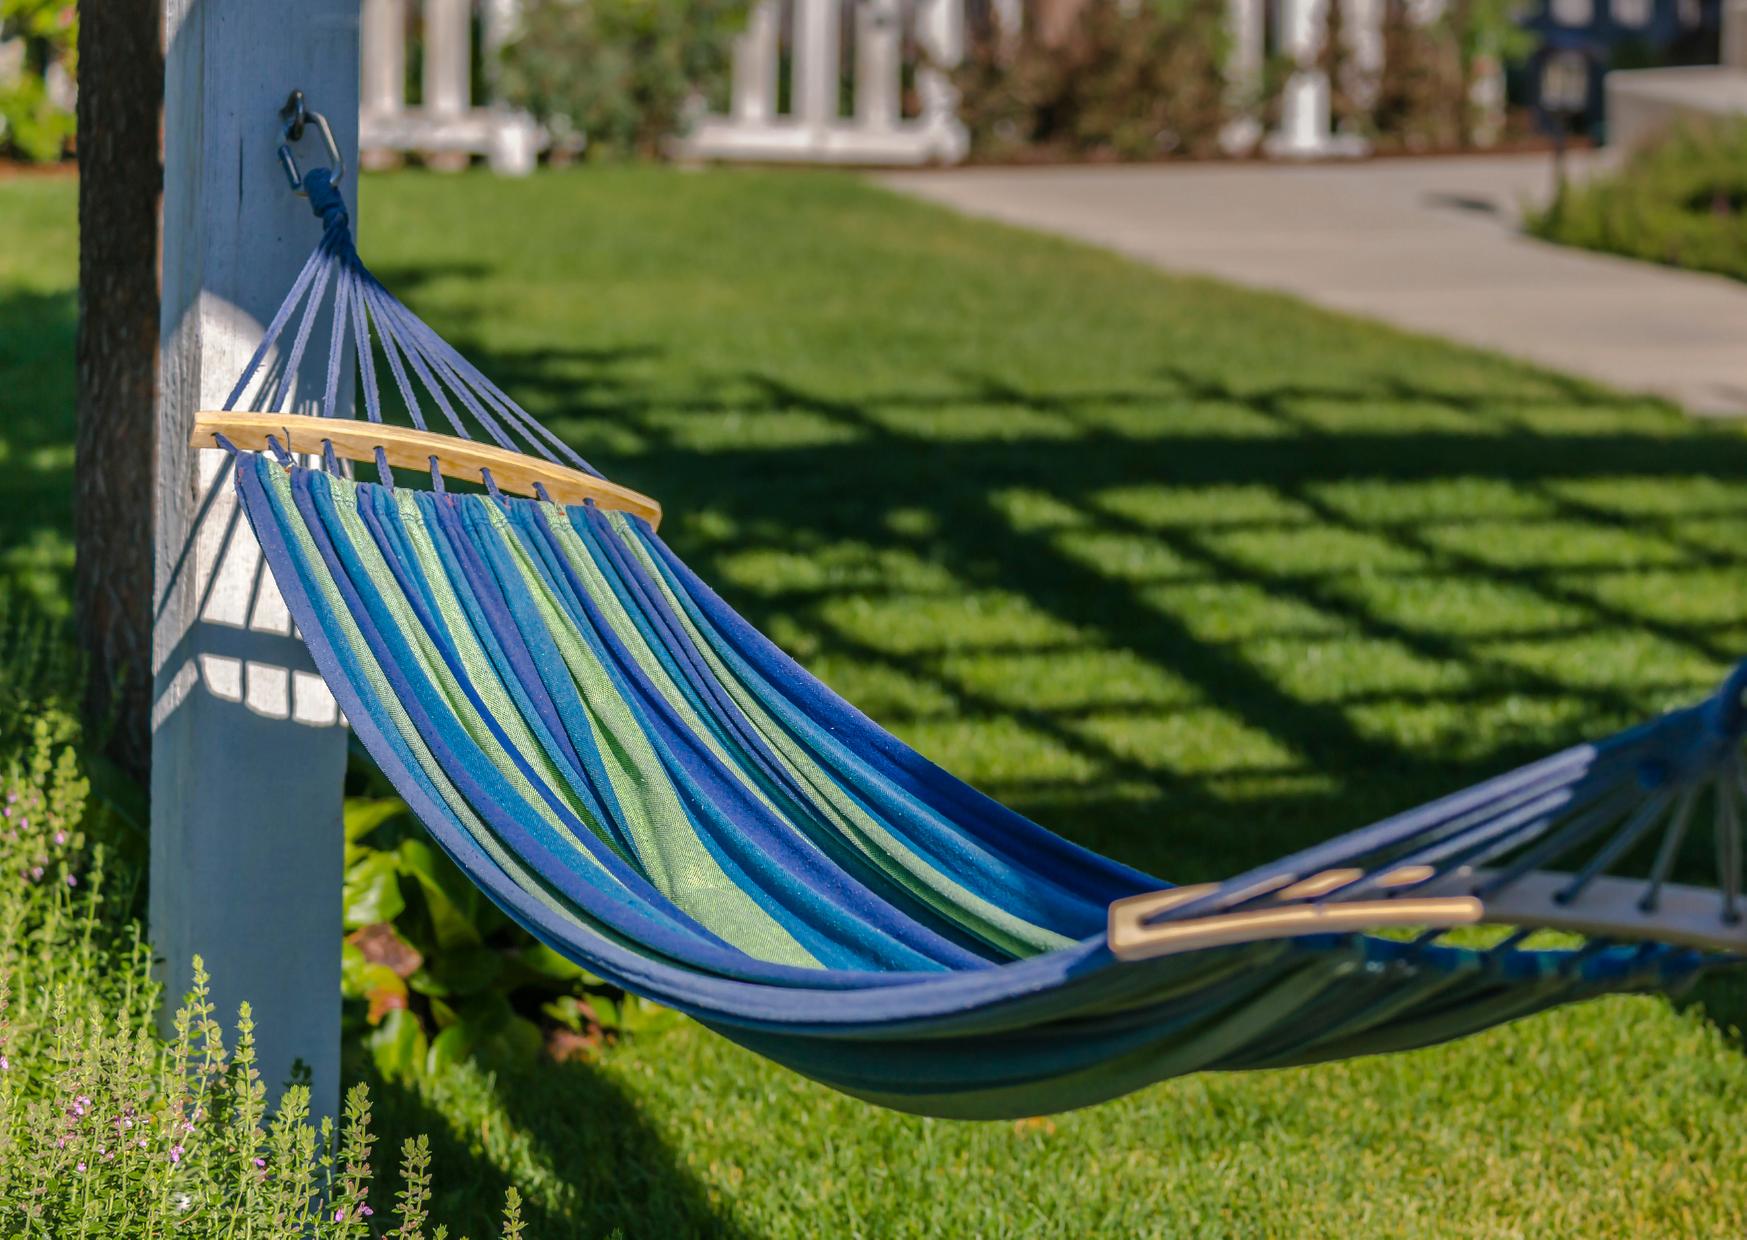 a blue and green stripe hammock in the backyard